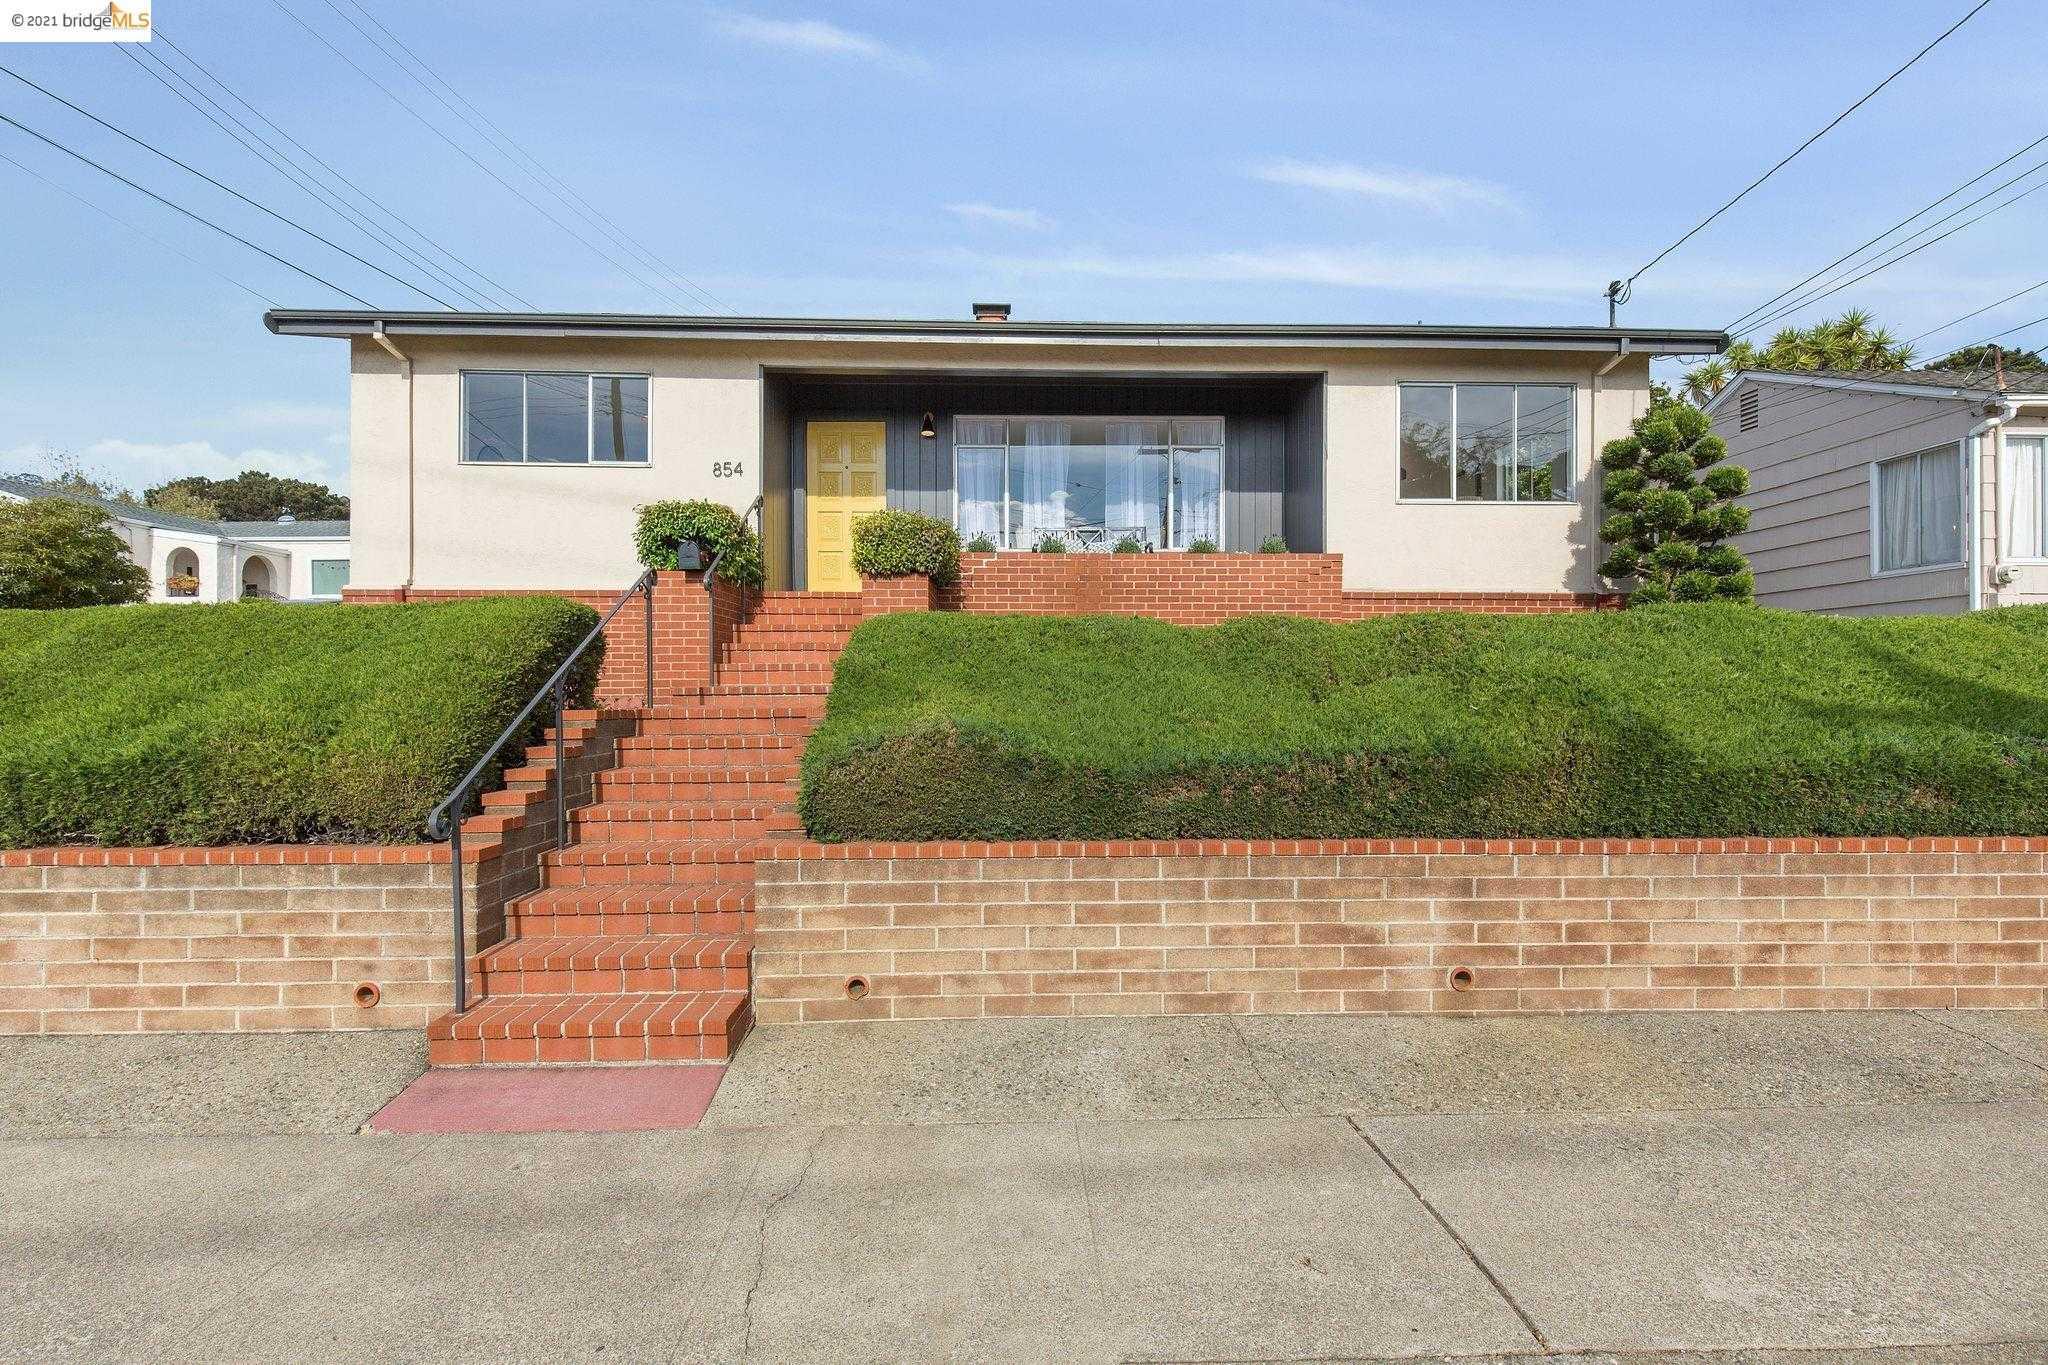 854 Pomona Ave